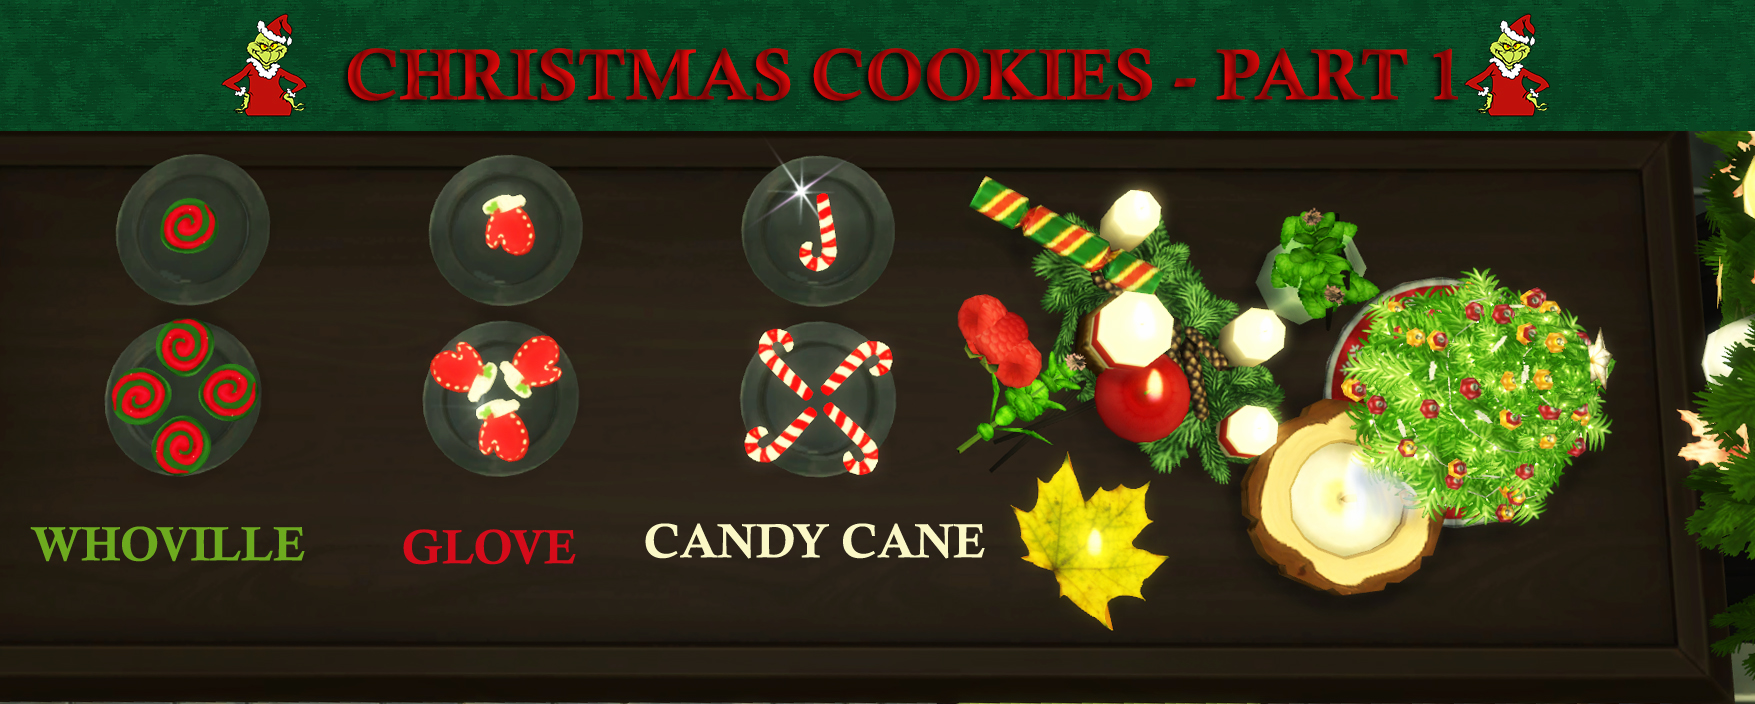 Mod The Sims Custom Christmas Cookies Part 2